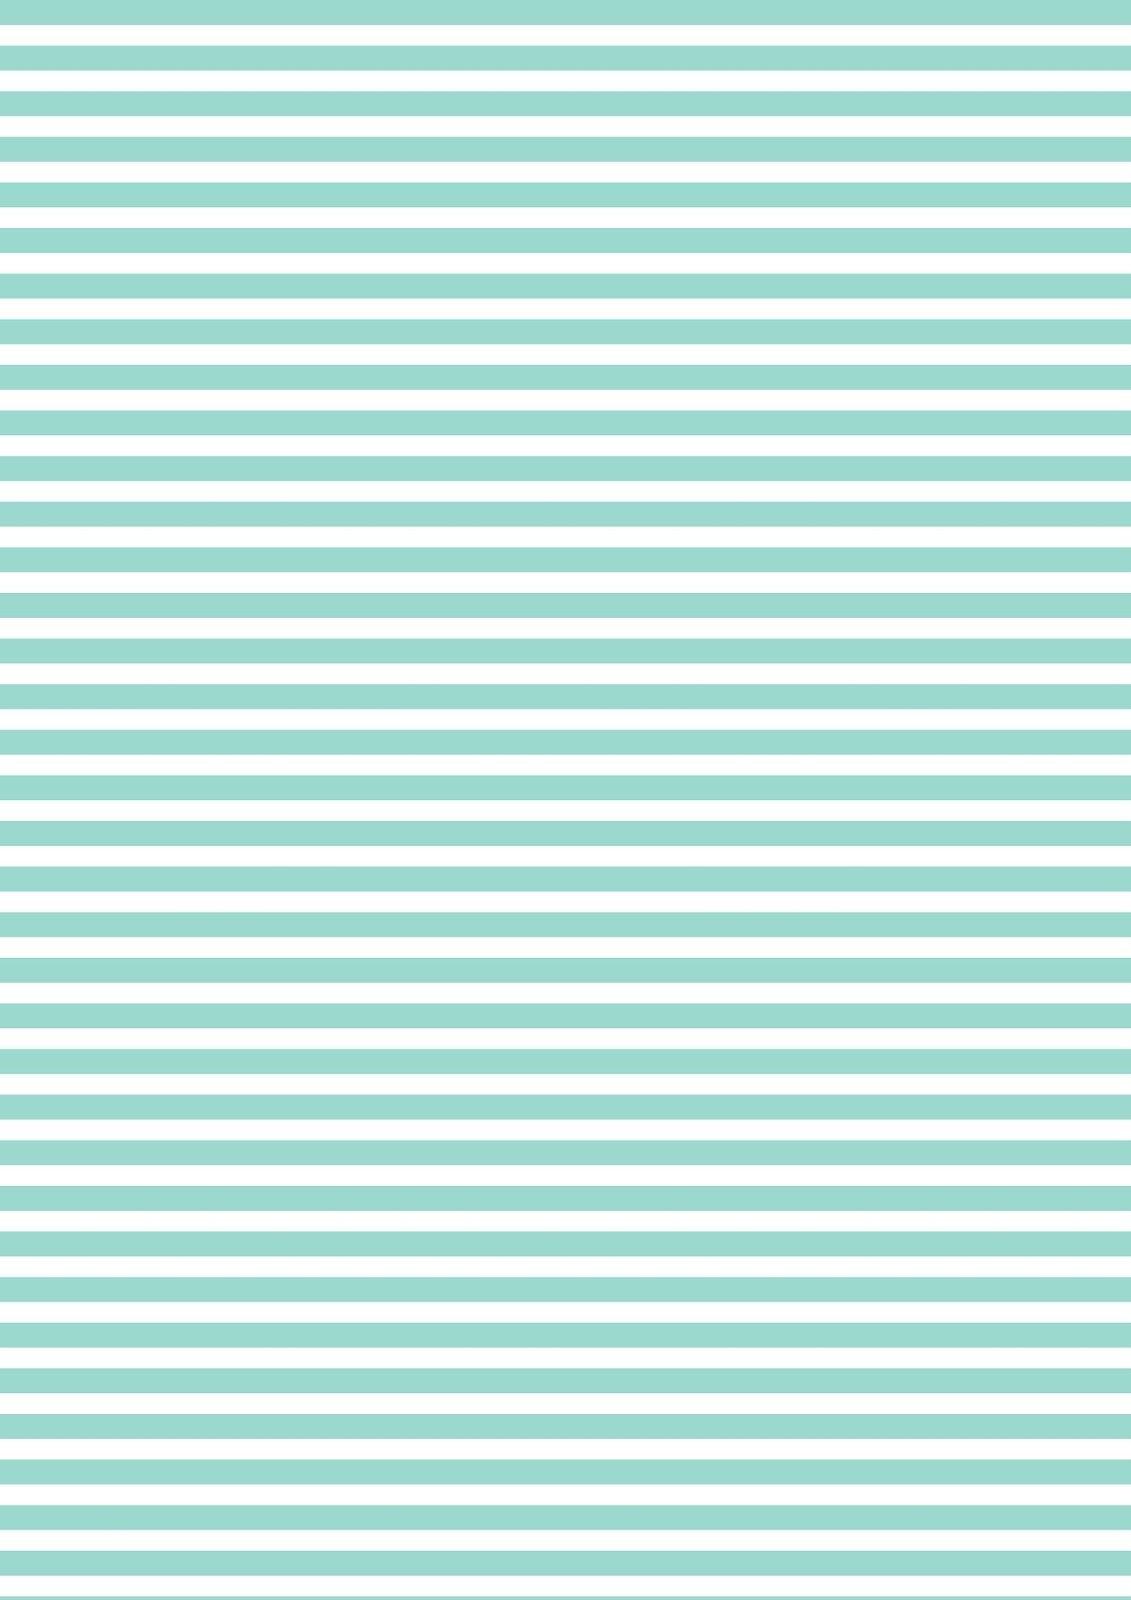 Scrapbook Backgrounds Printables Free Printable Turquoise White - Free Printable Backgrounds For Paper